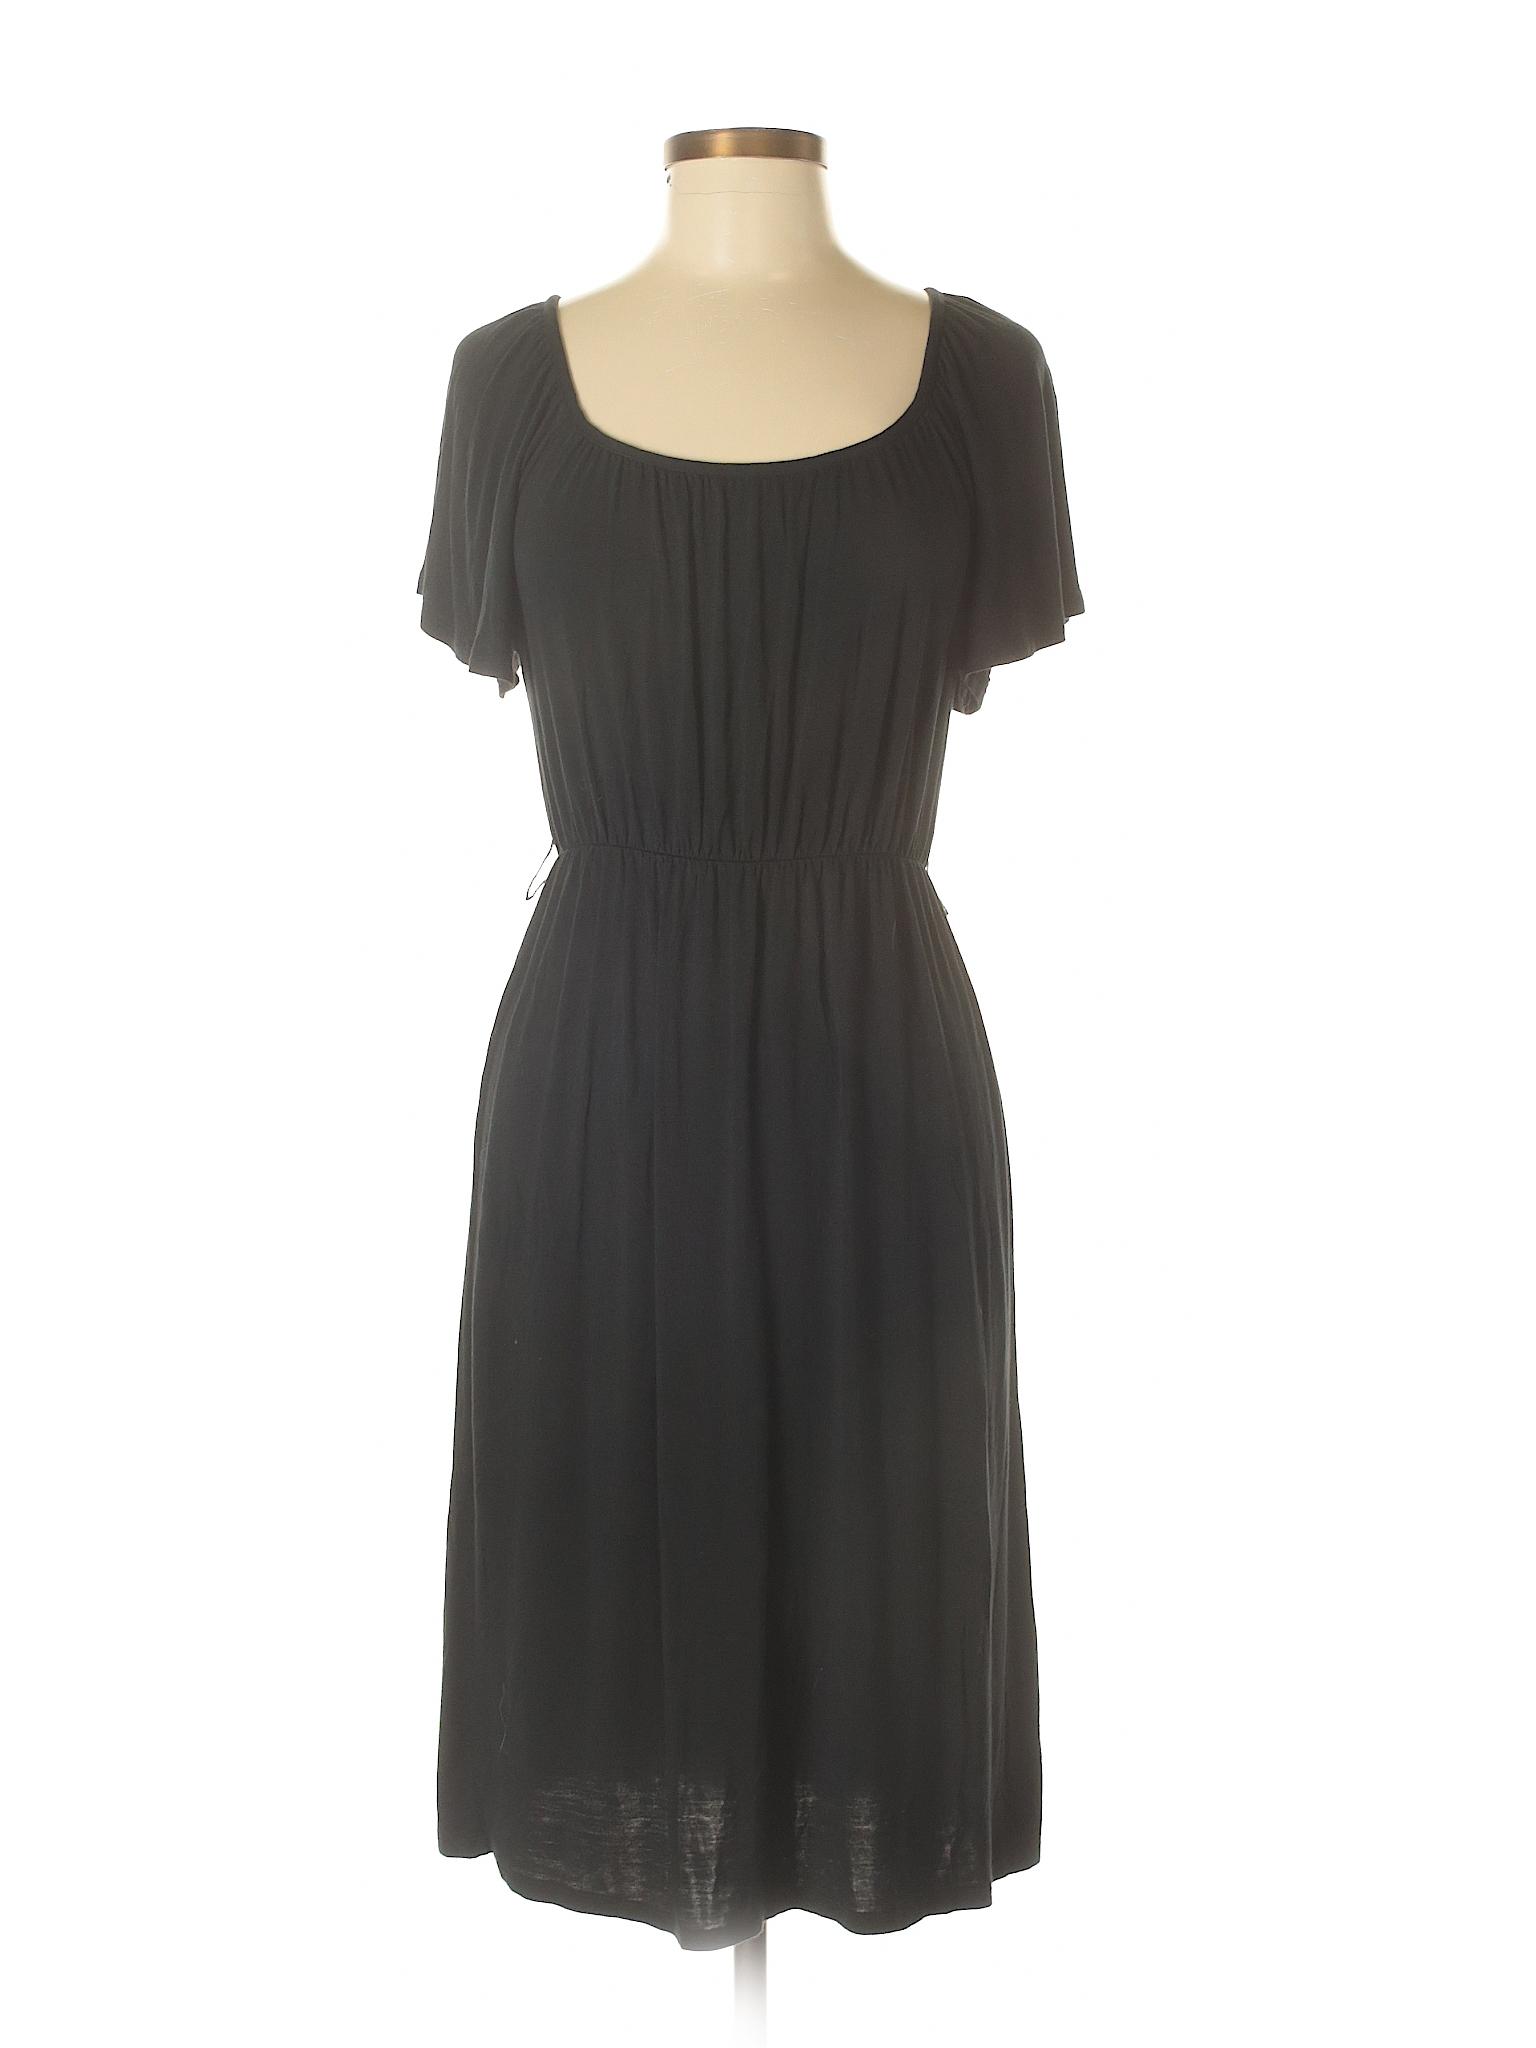 Dress Dress winter Boutique winter Merona Merona Boutique Casual Boutique Casual IBwaffx